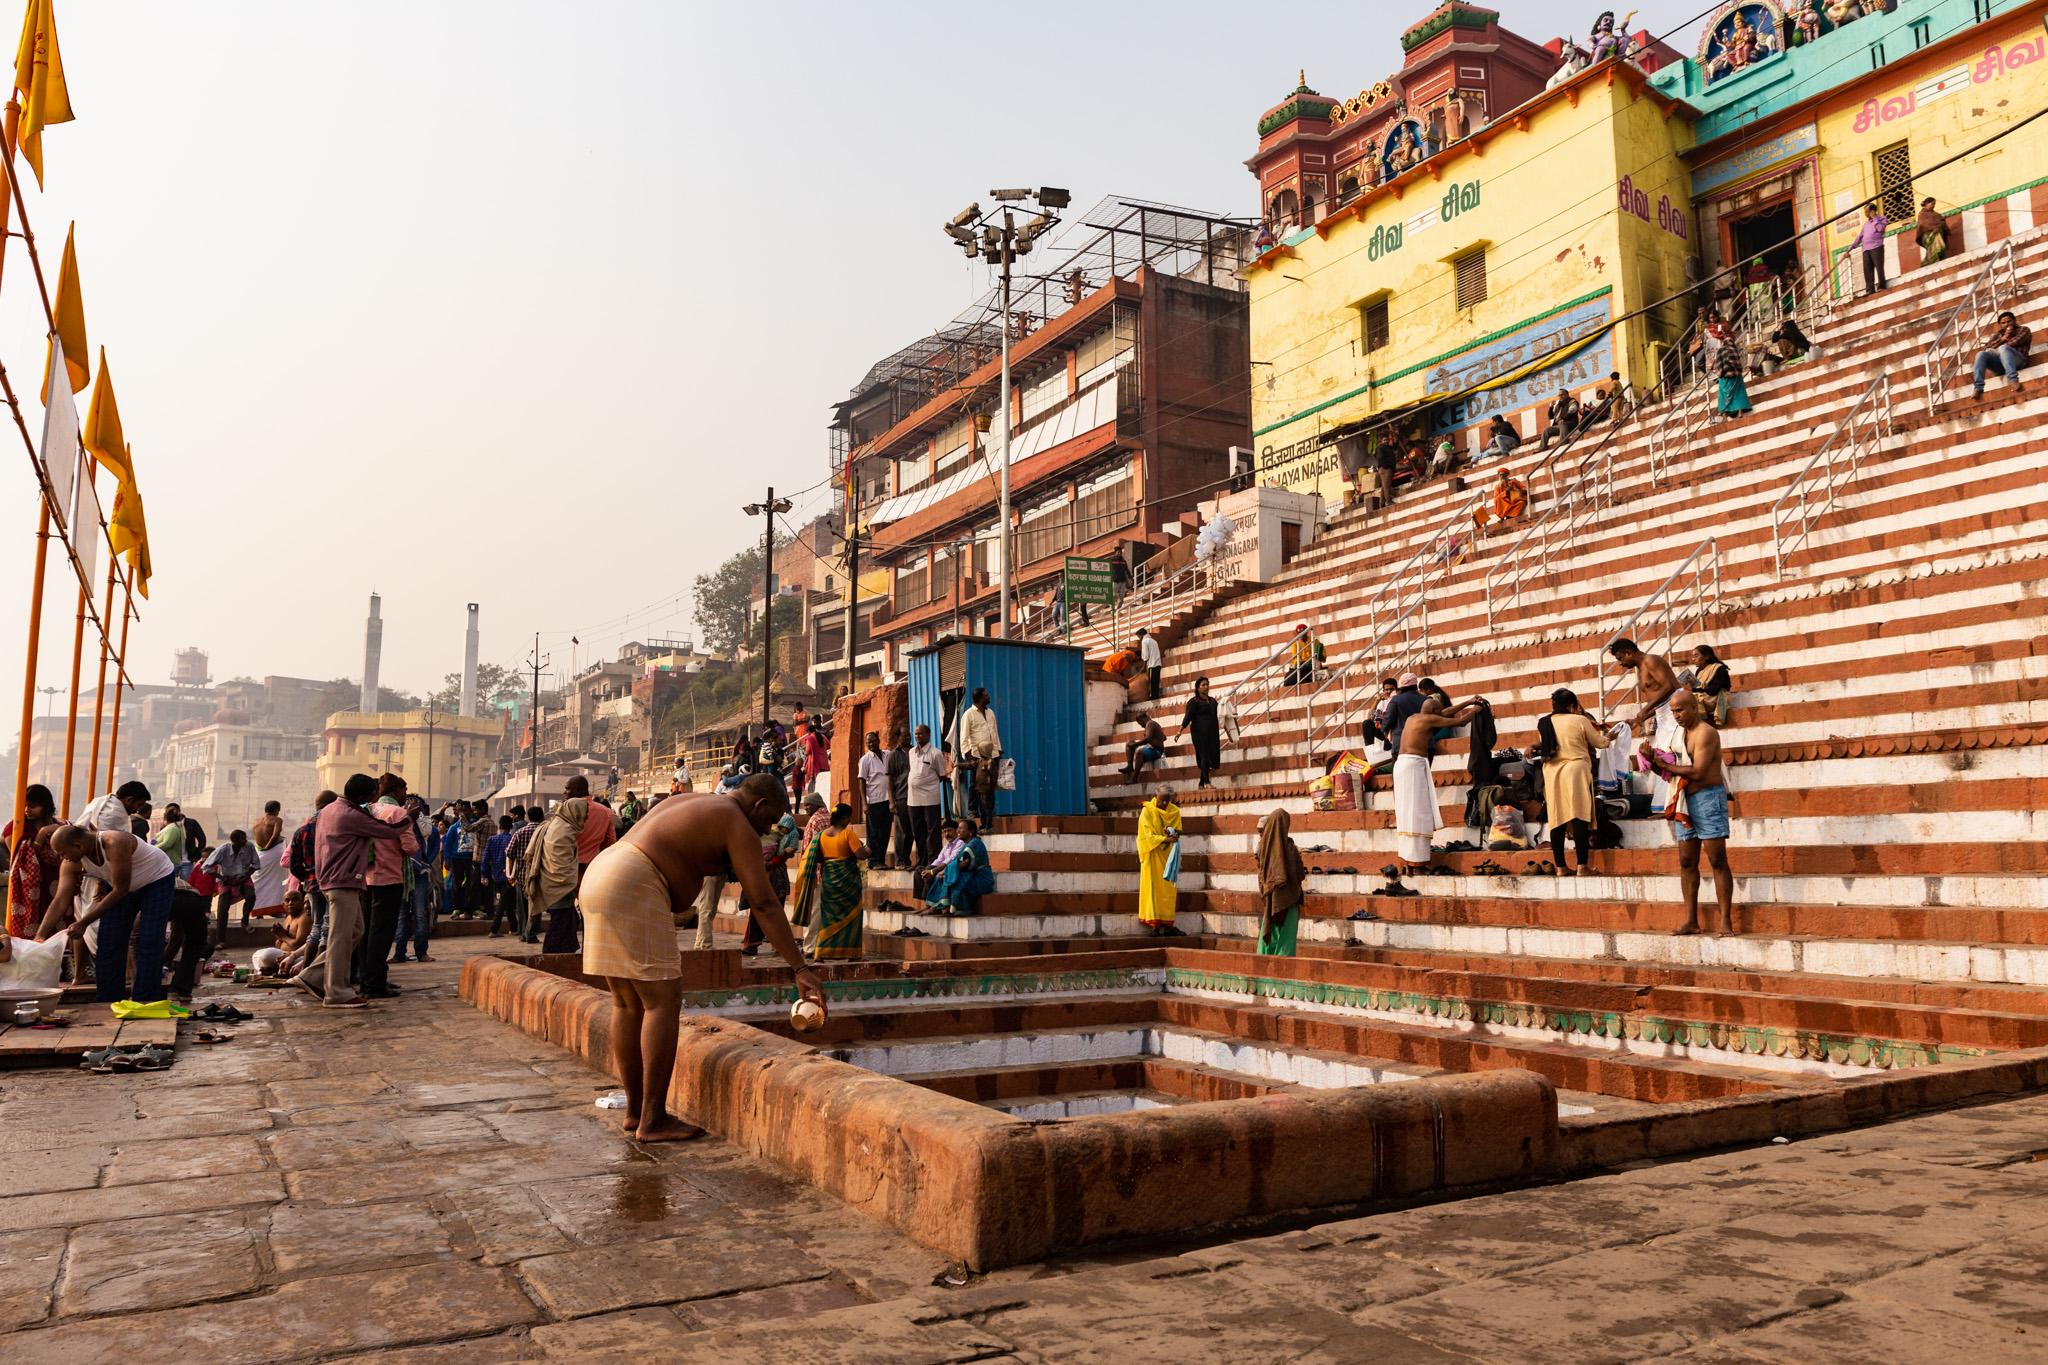 Ceremony pit in Varanasi, India.